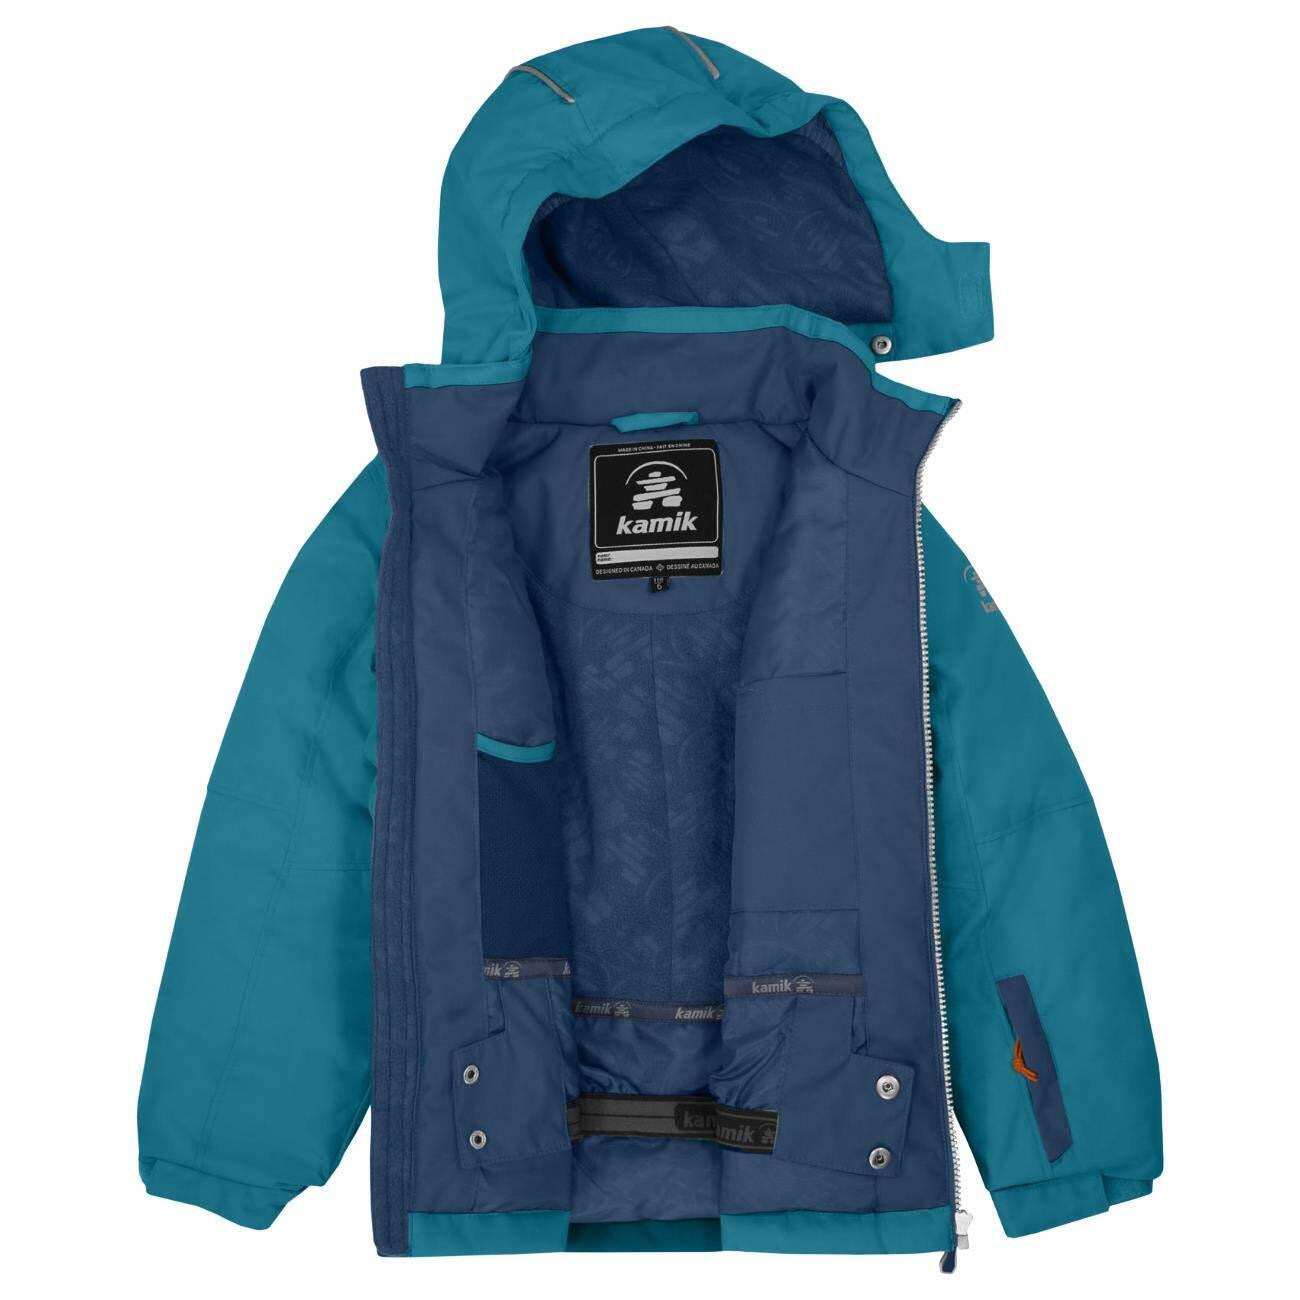 Bild zu skibekleidung kinder, mädchen, jungen, skihose, skijacke, kinder skihelme, salomon, uvex, alpina